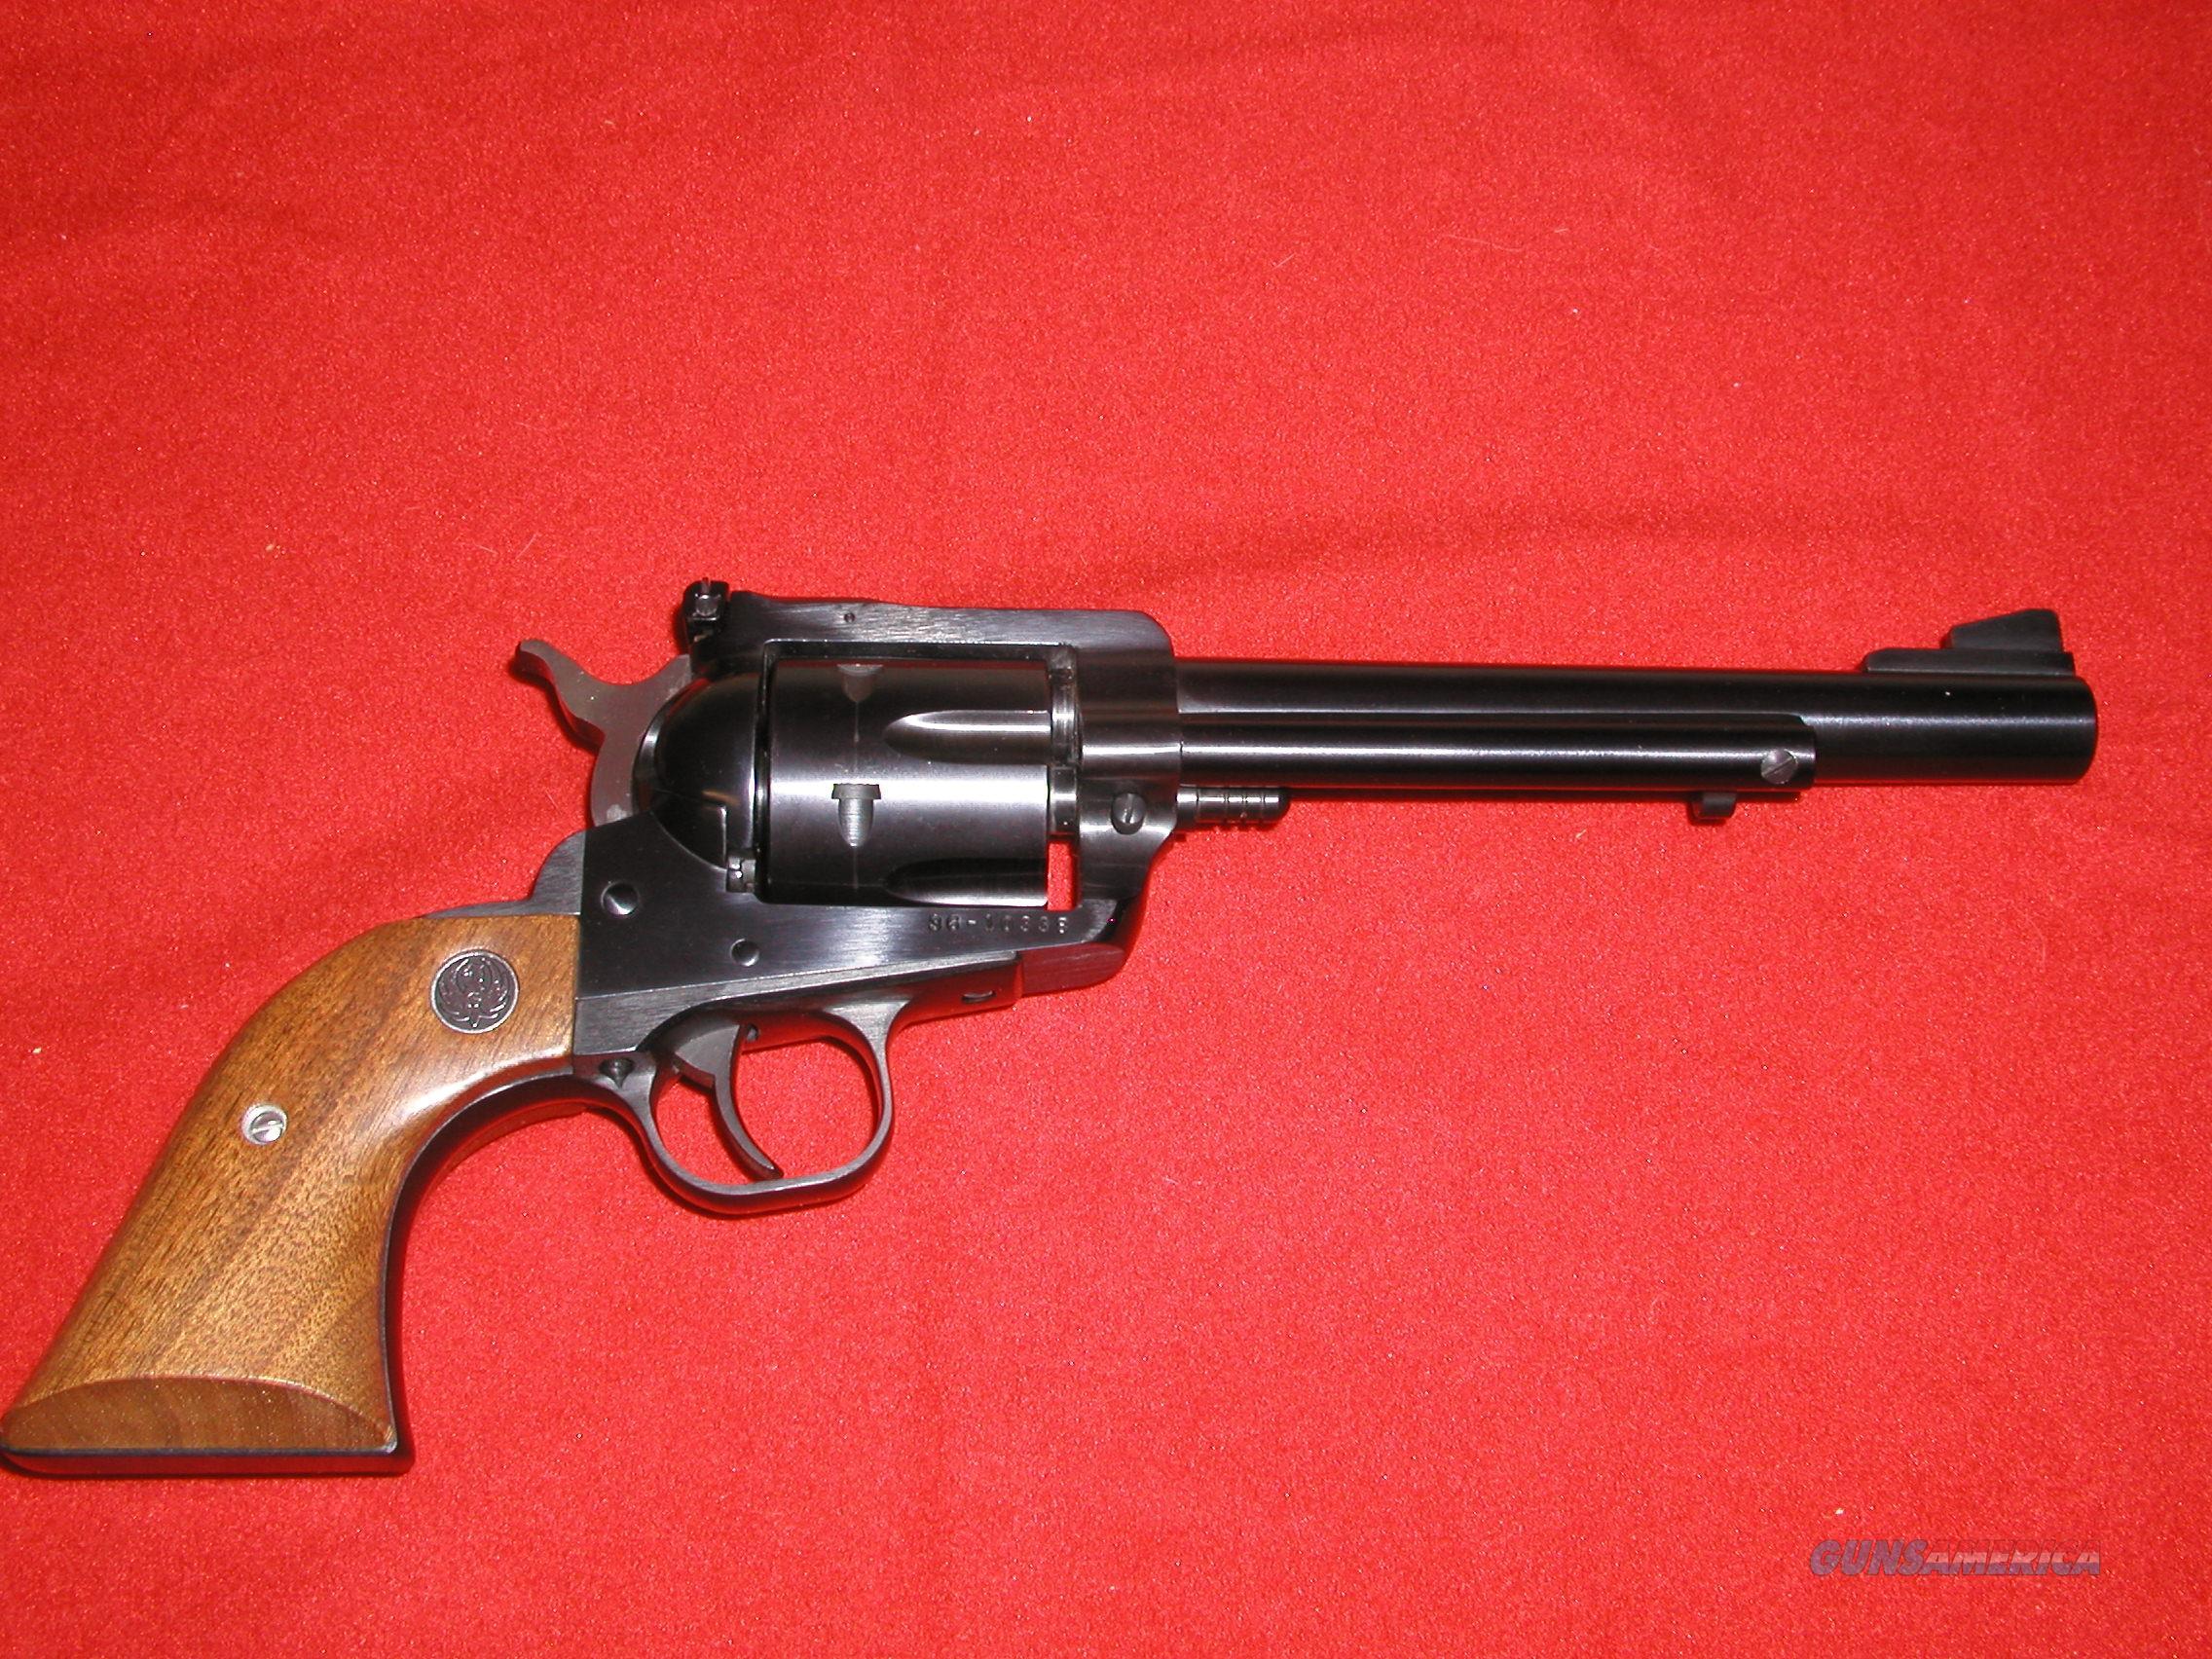 RUGER New Model Blackhawk, .357Magnum Single Action Revolver  Guns > Pistols > Ruger Single Action Revolvers > Blackhawk Type